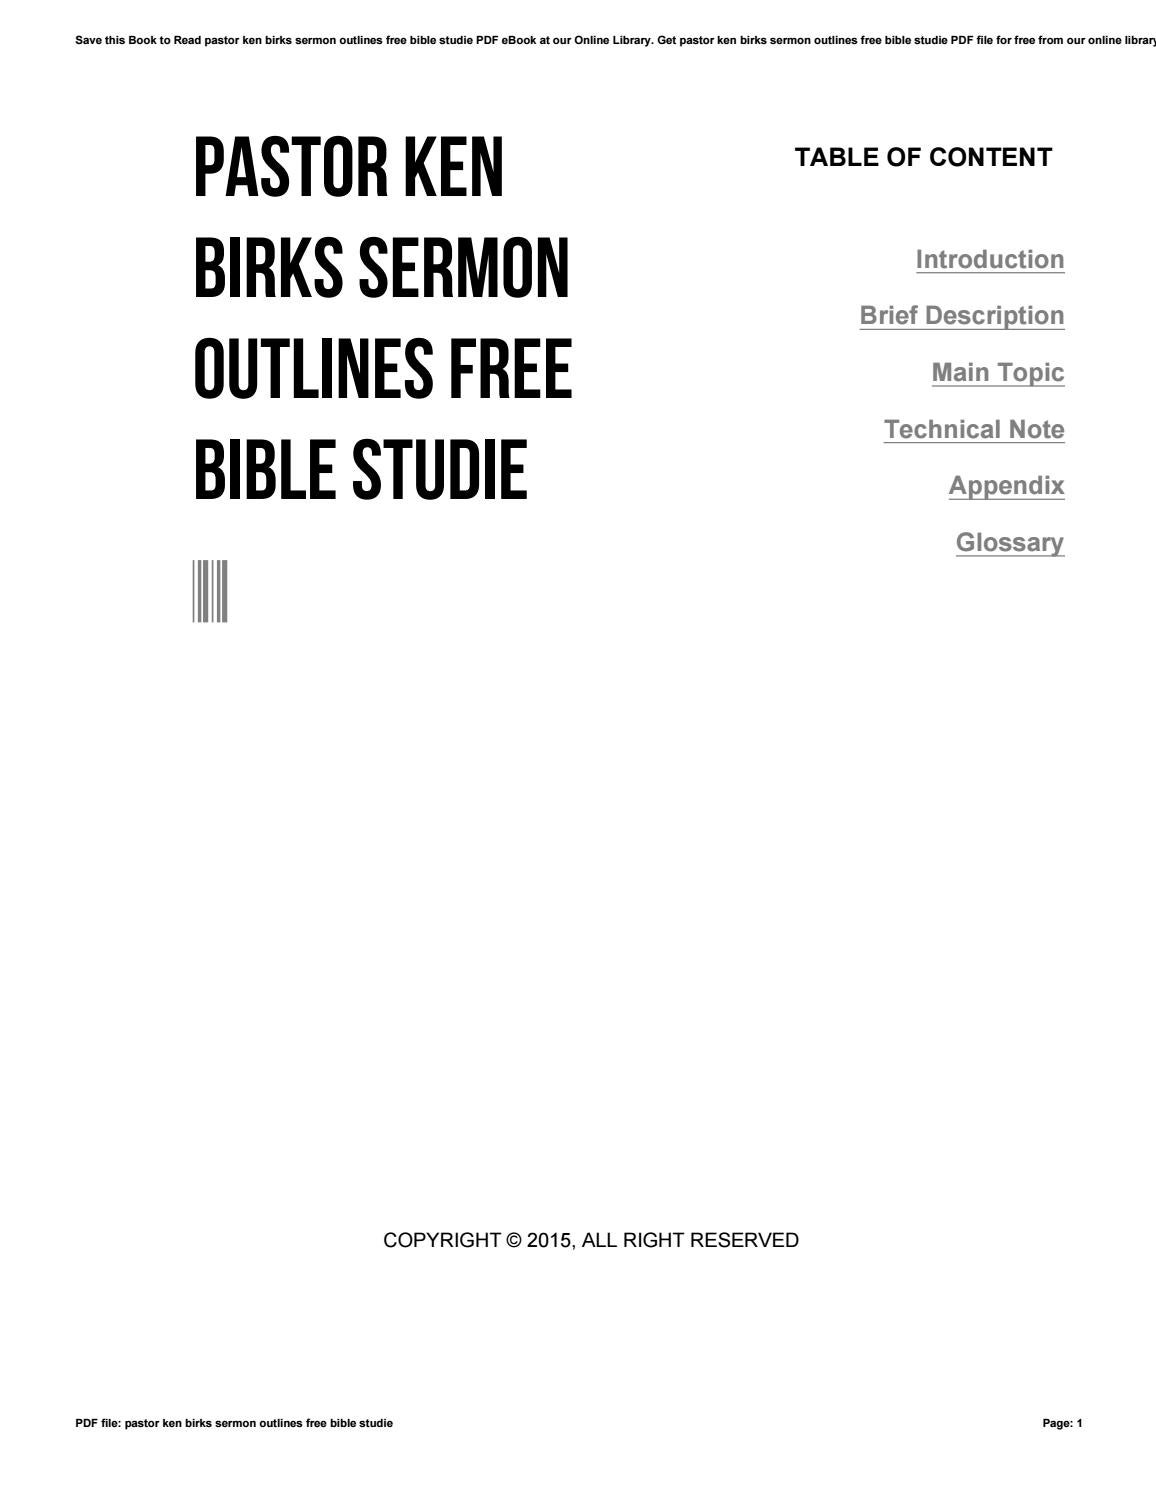 Pastor ken birks sermon outlines free bible studie by u333